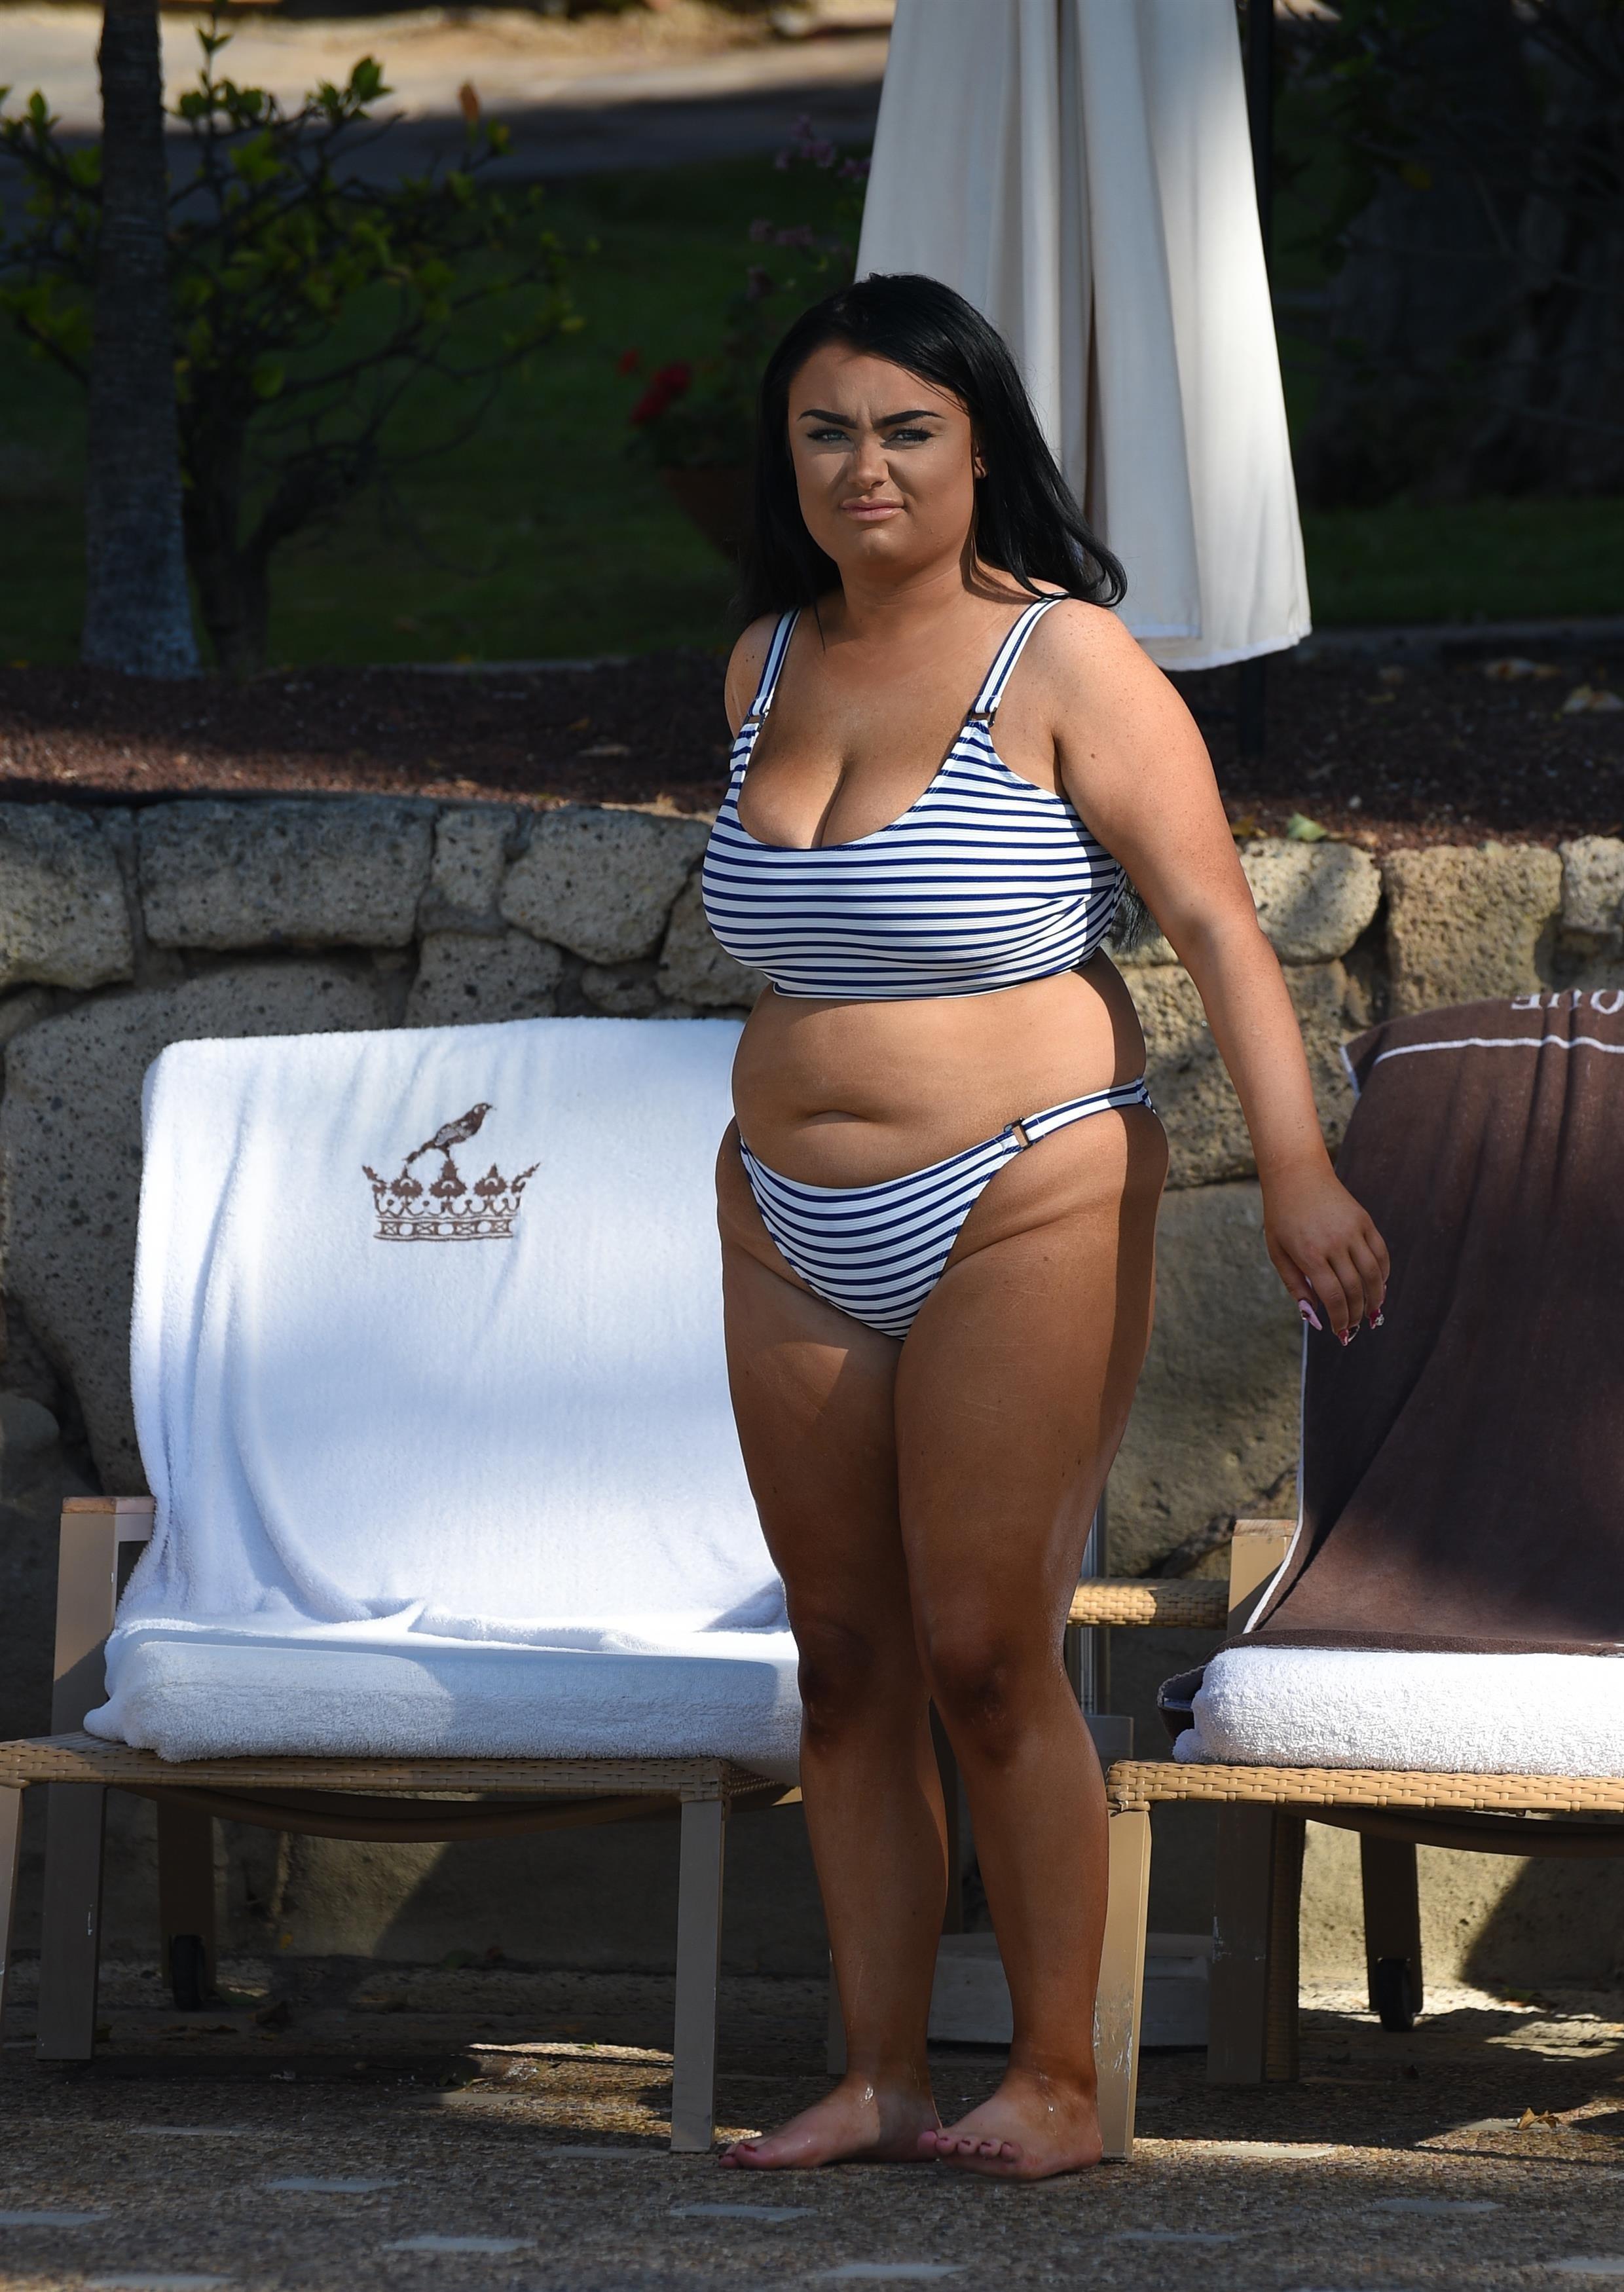 Feet Faith Mullen nude (86 photo), Tits, Sideboobs, Feet, cameltoe 2020